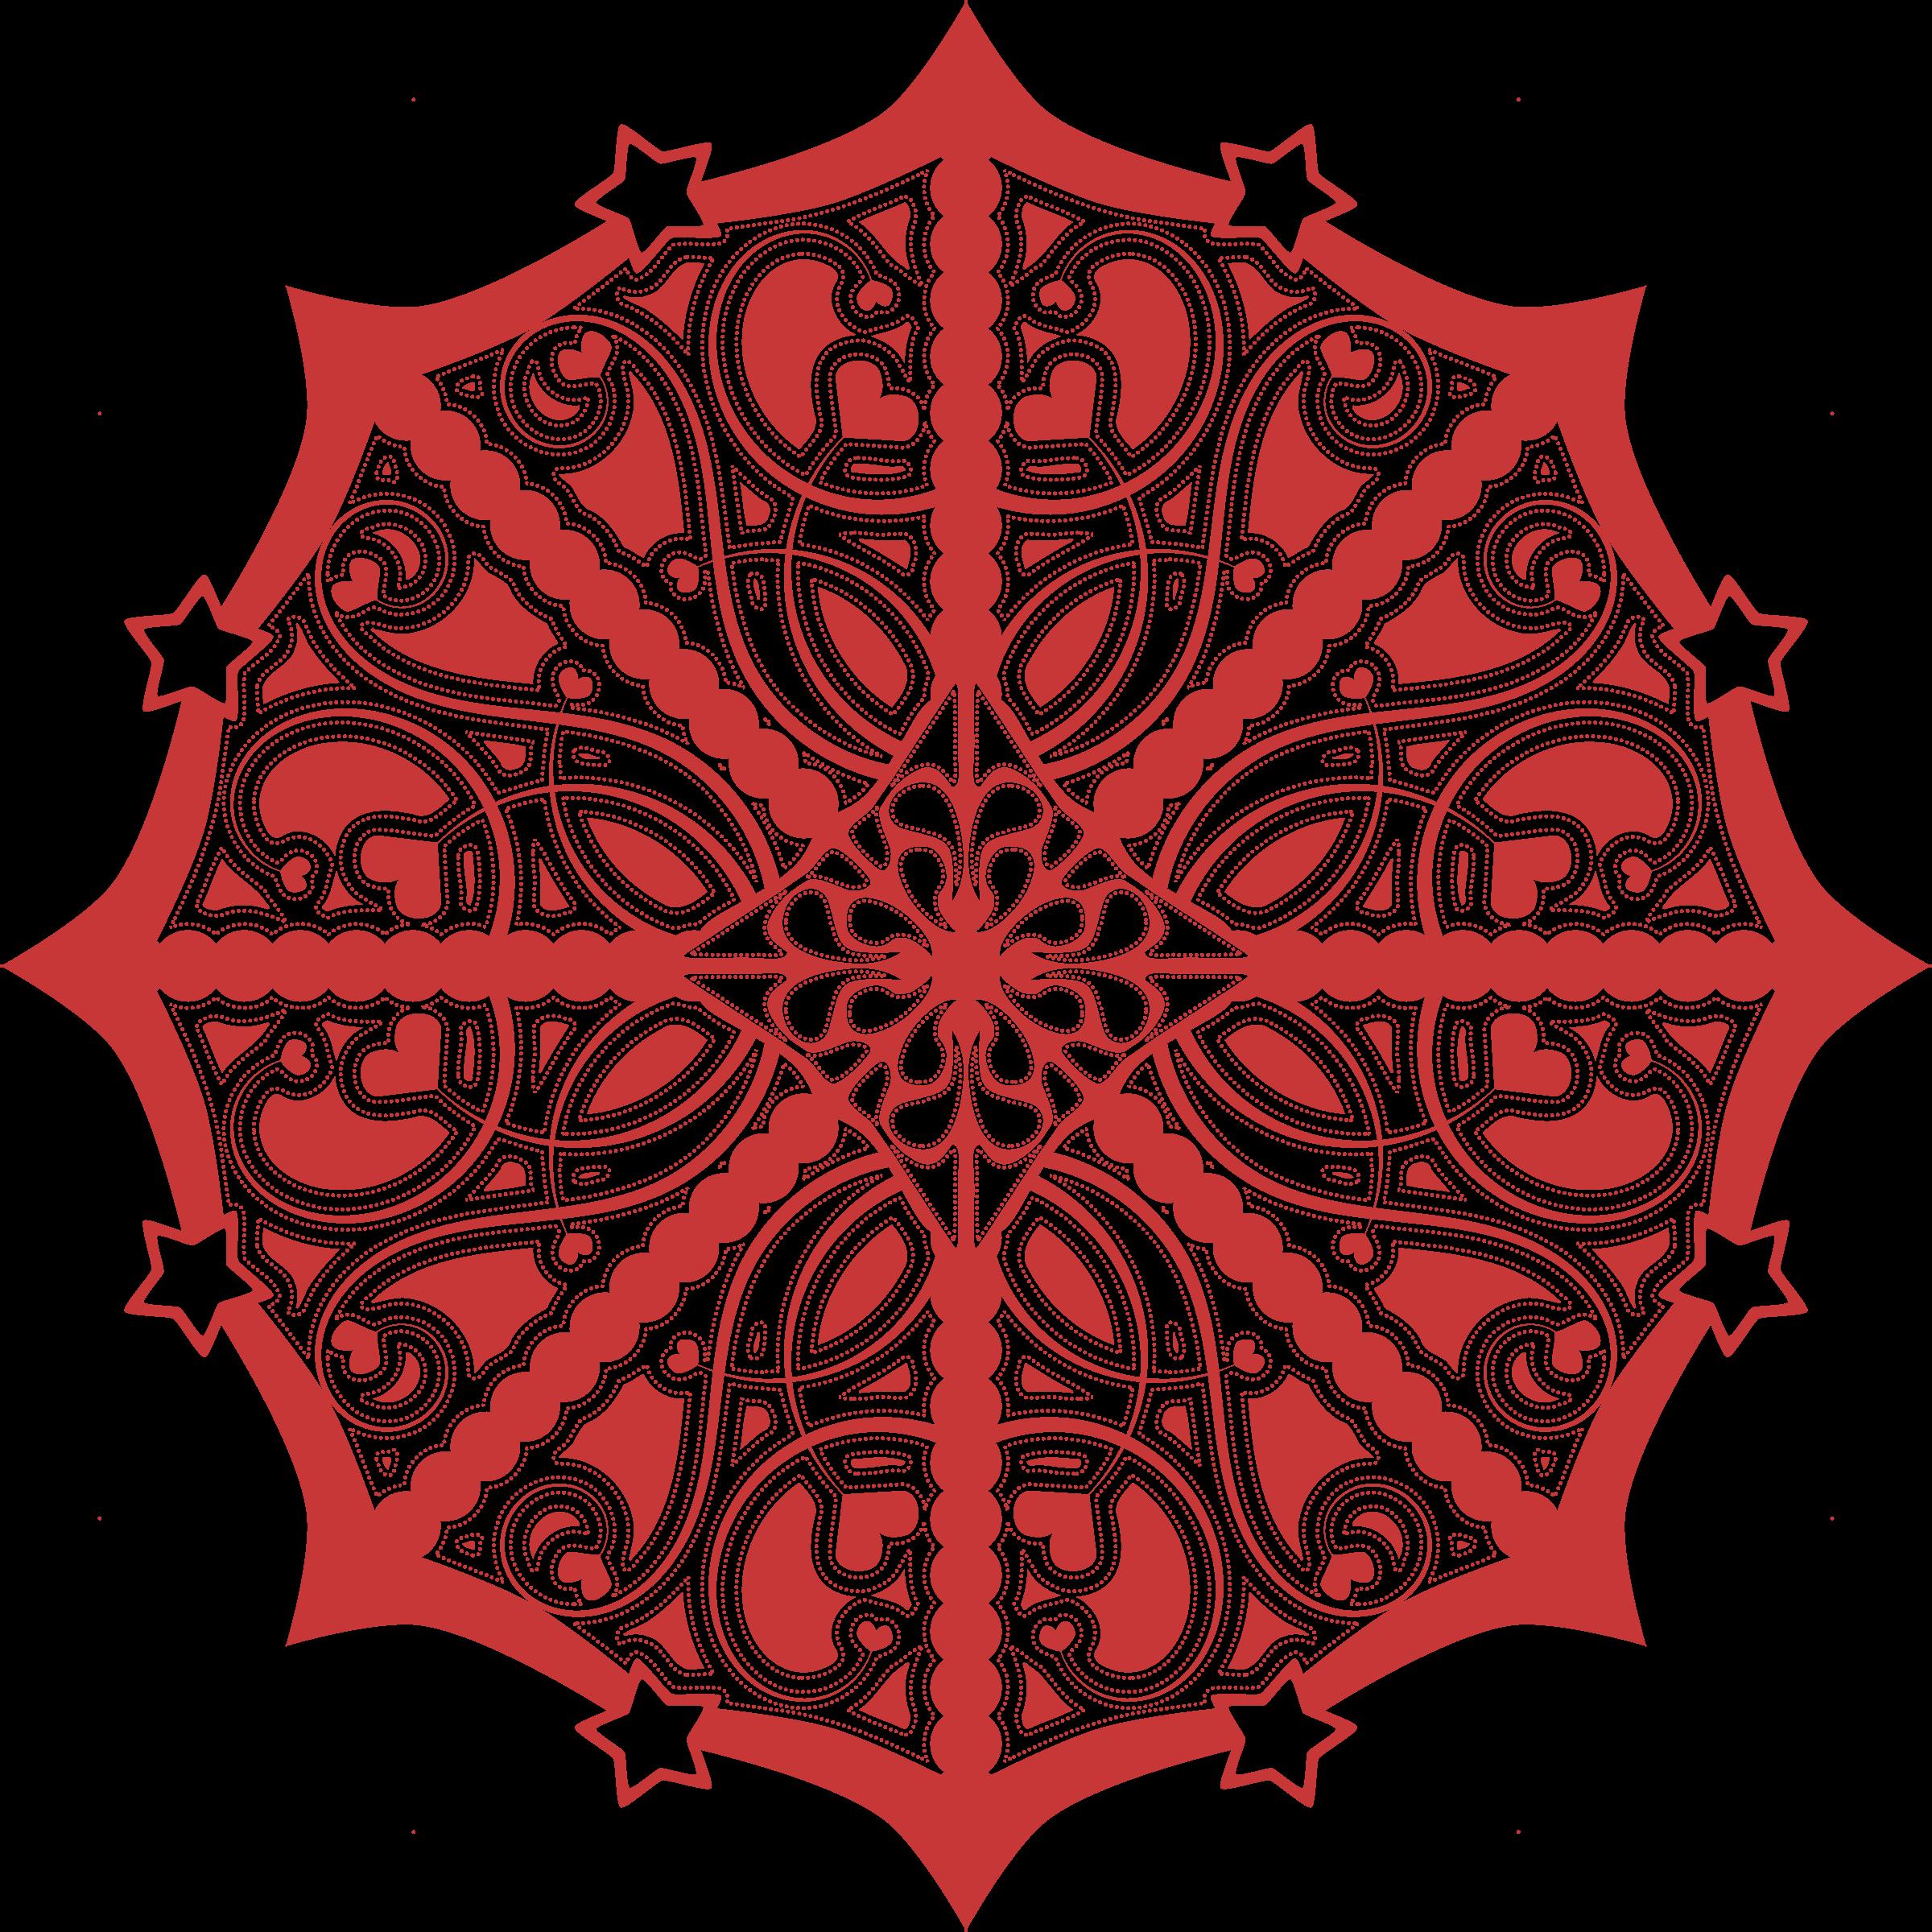 Abstract snowflake clipart jpg Clipart - snowflake jpg